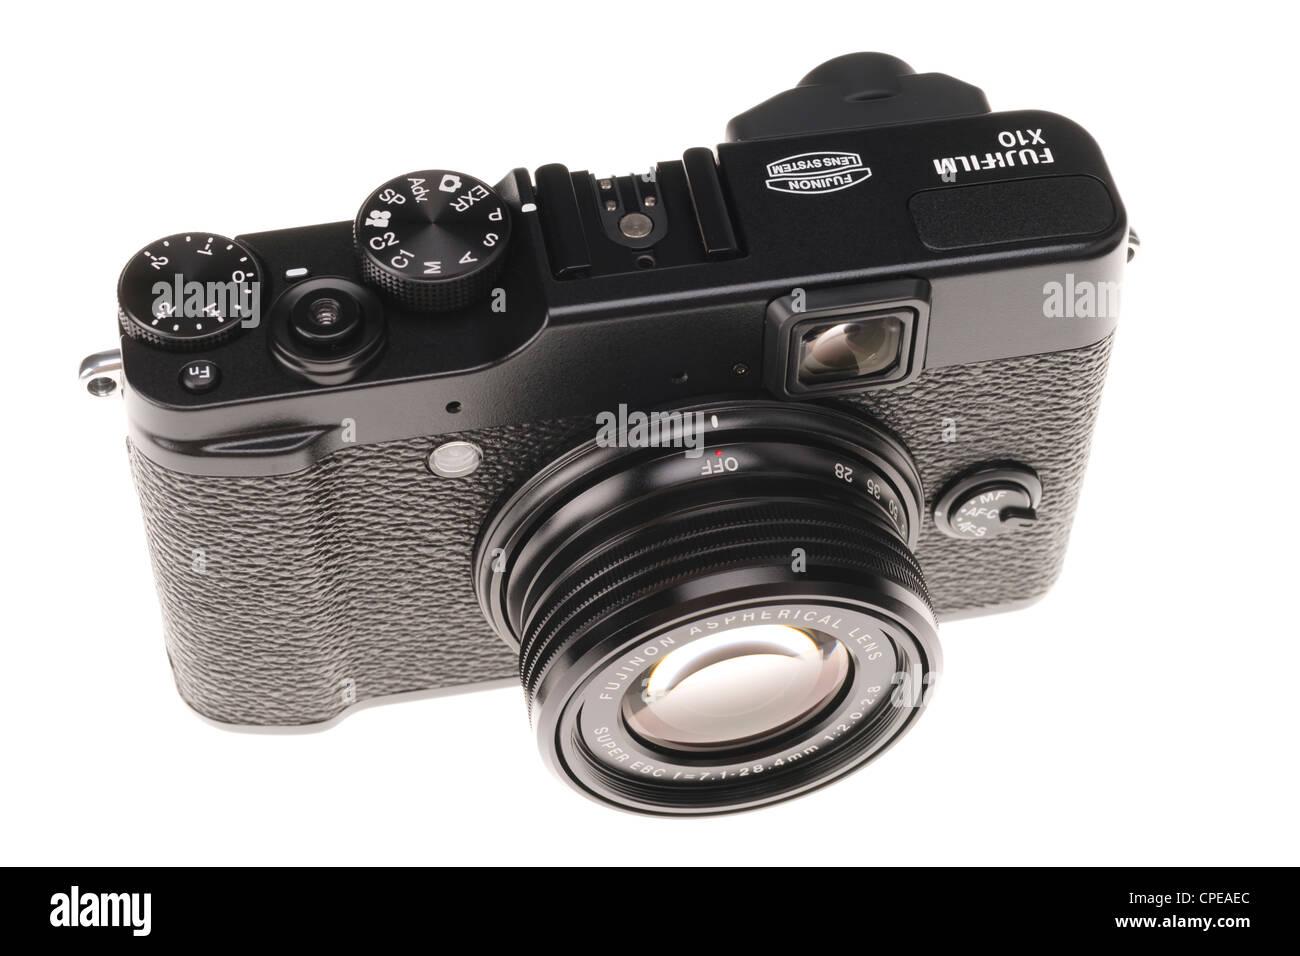 Fujifilm X10 small pocketable advanced digital camera 2012 - Stock Image